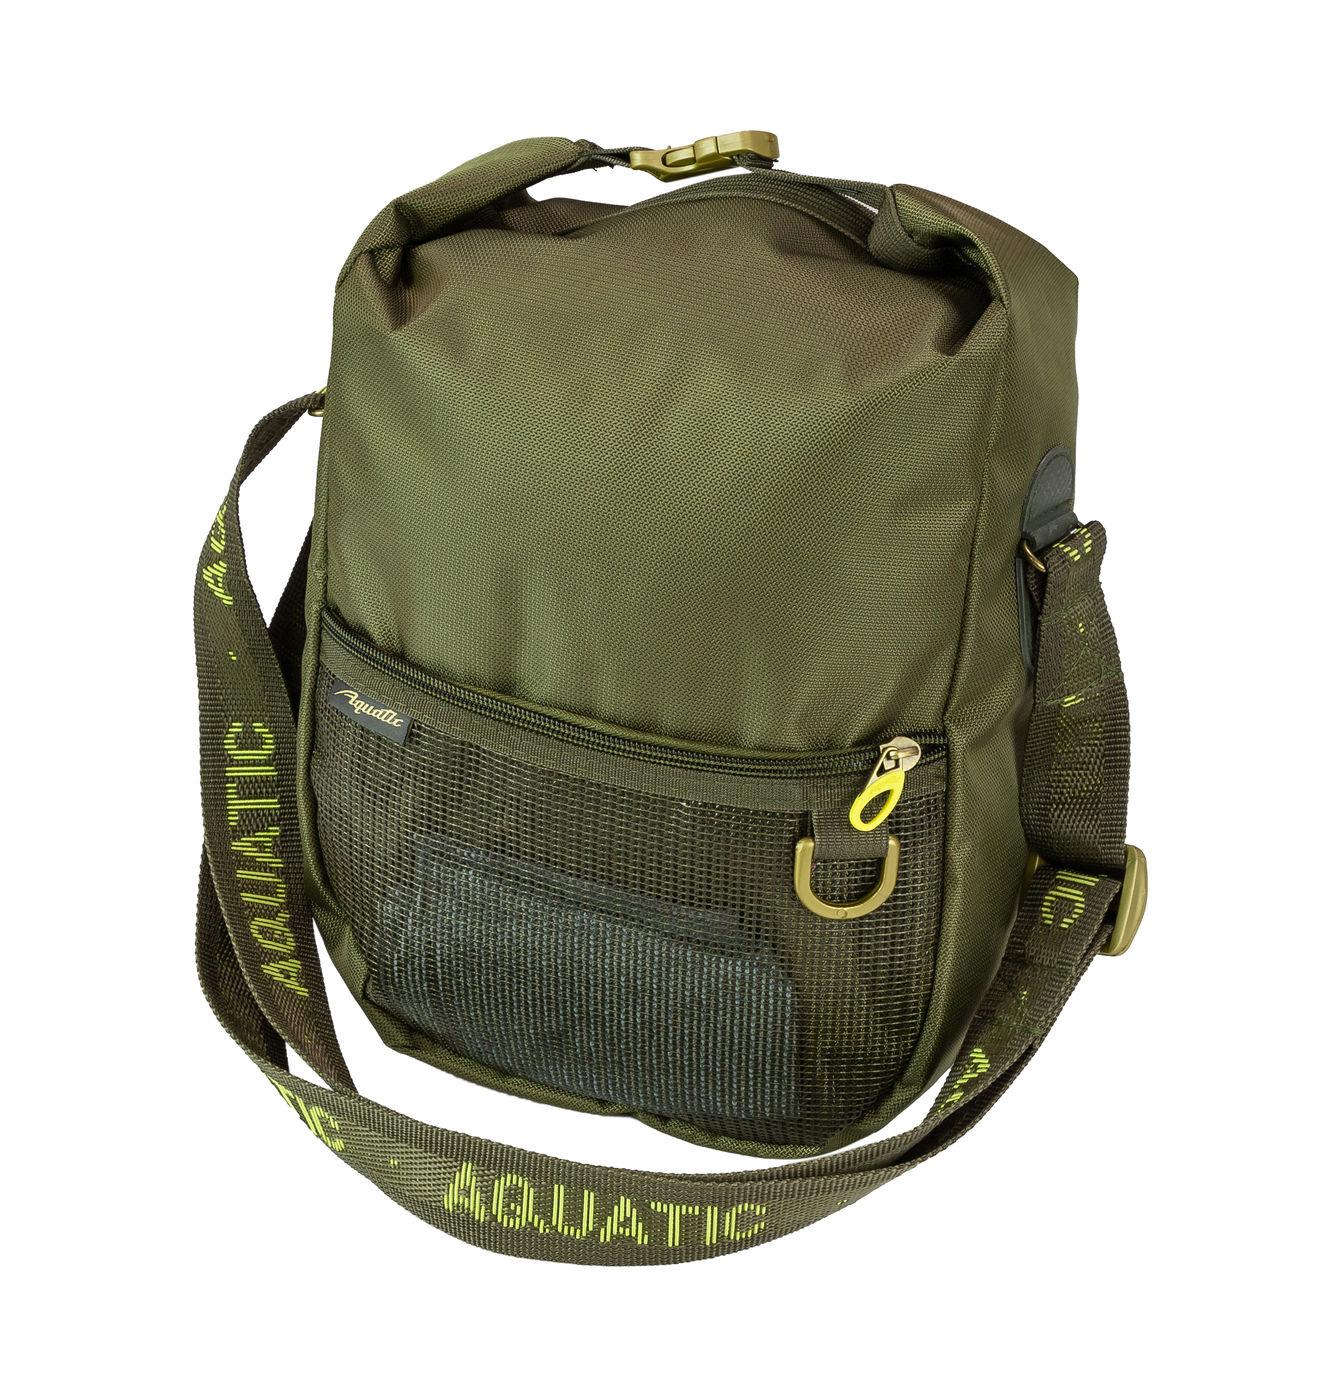 Bag For Fish And Accessories Aquatic C-18 C-18